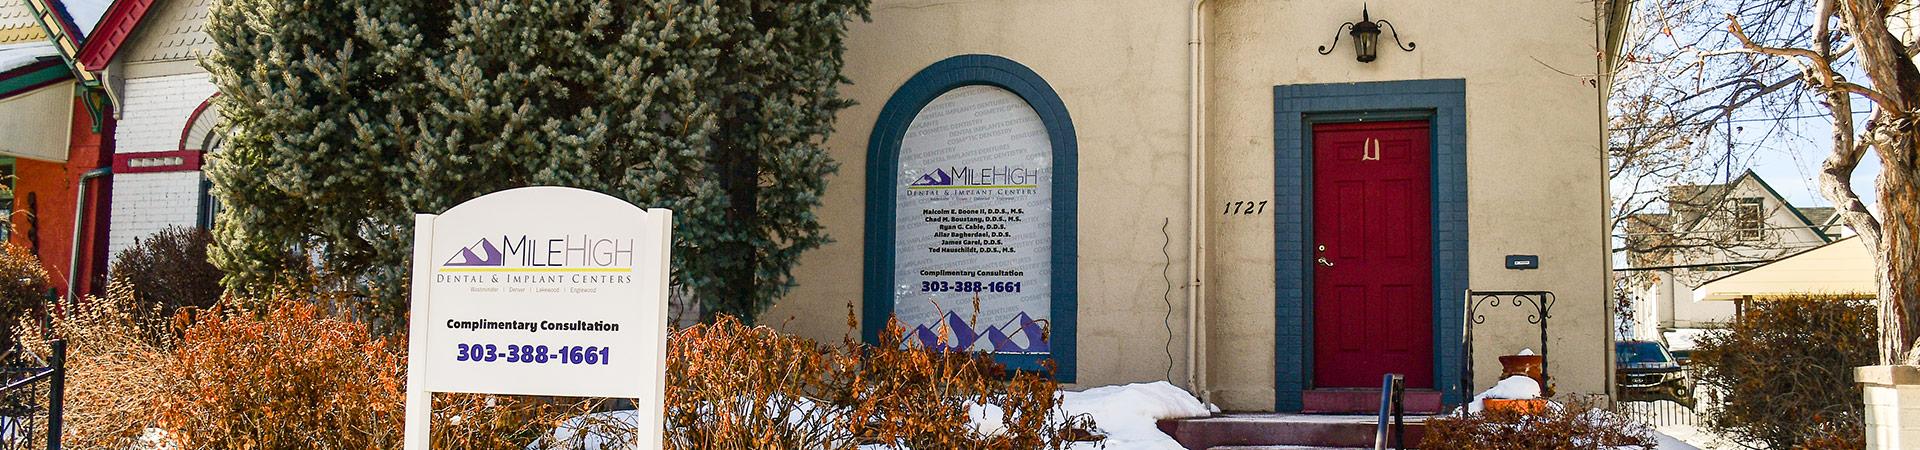 Outside Denver Location of Mile High Dental & Implant Centers